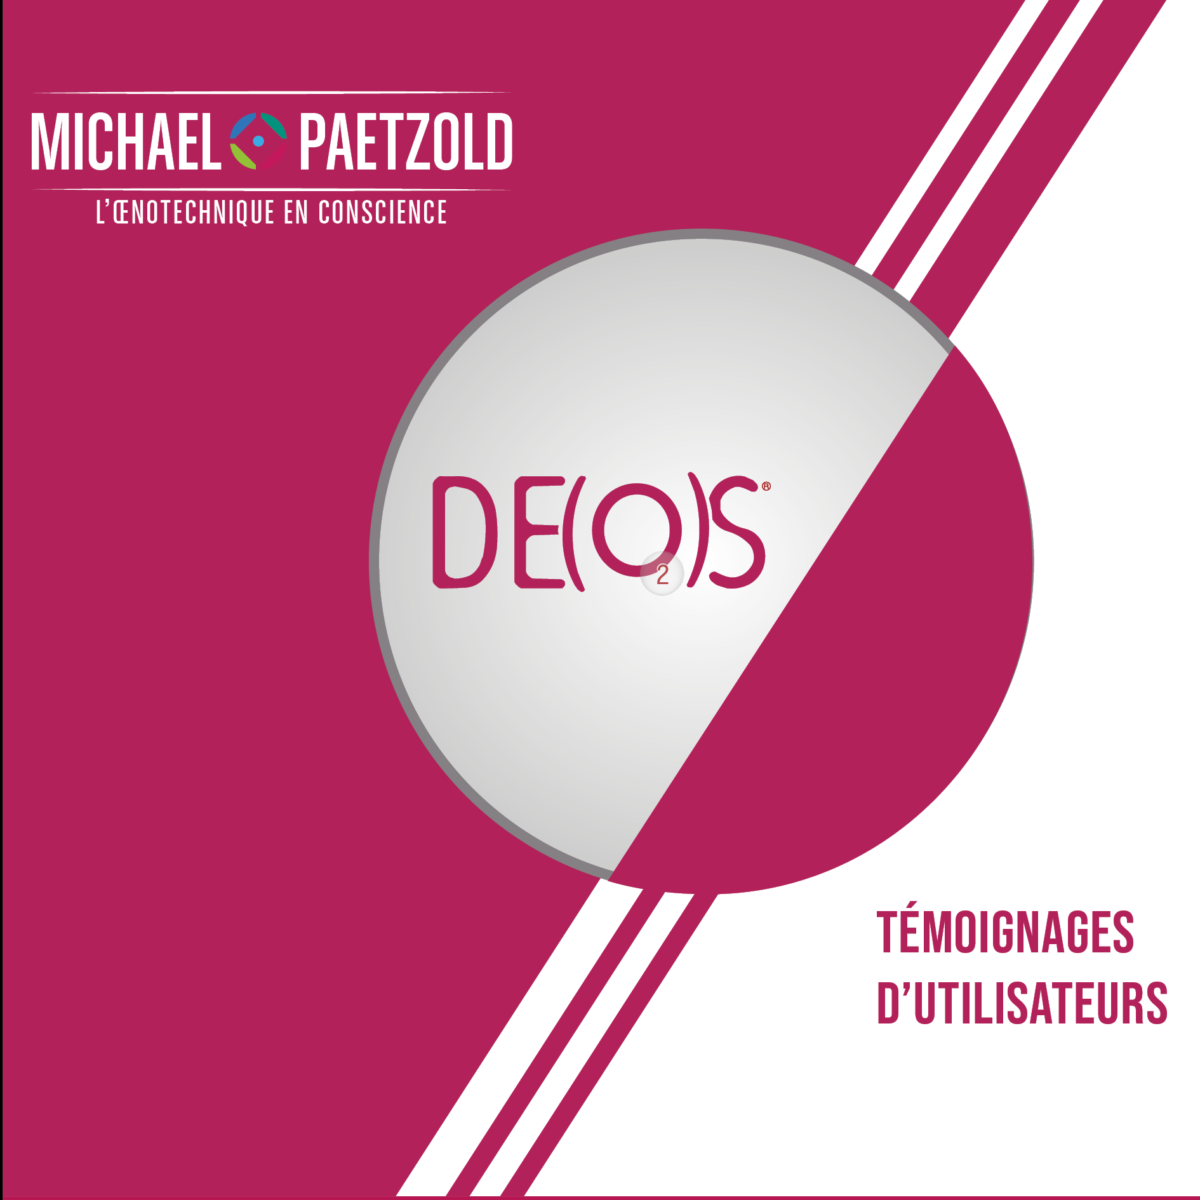 Témoignages Deos Michael Paetzold15 2